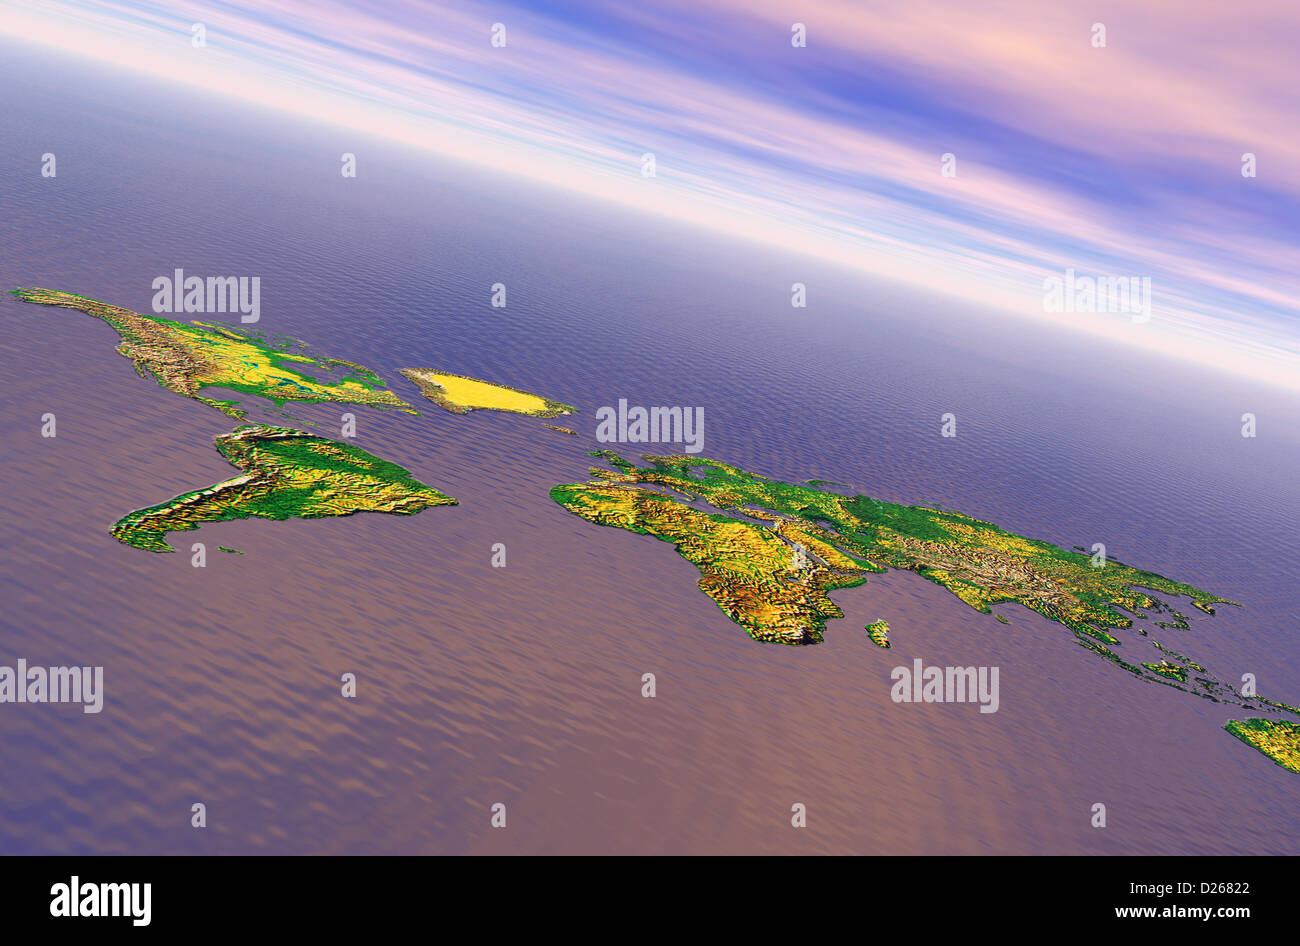 World Topographic Map Stock Photos & World Topographic Map Stock ...